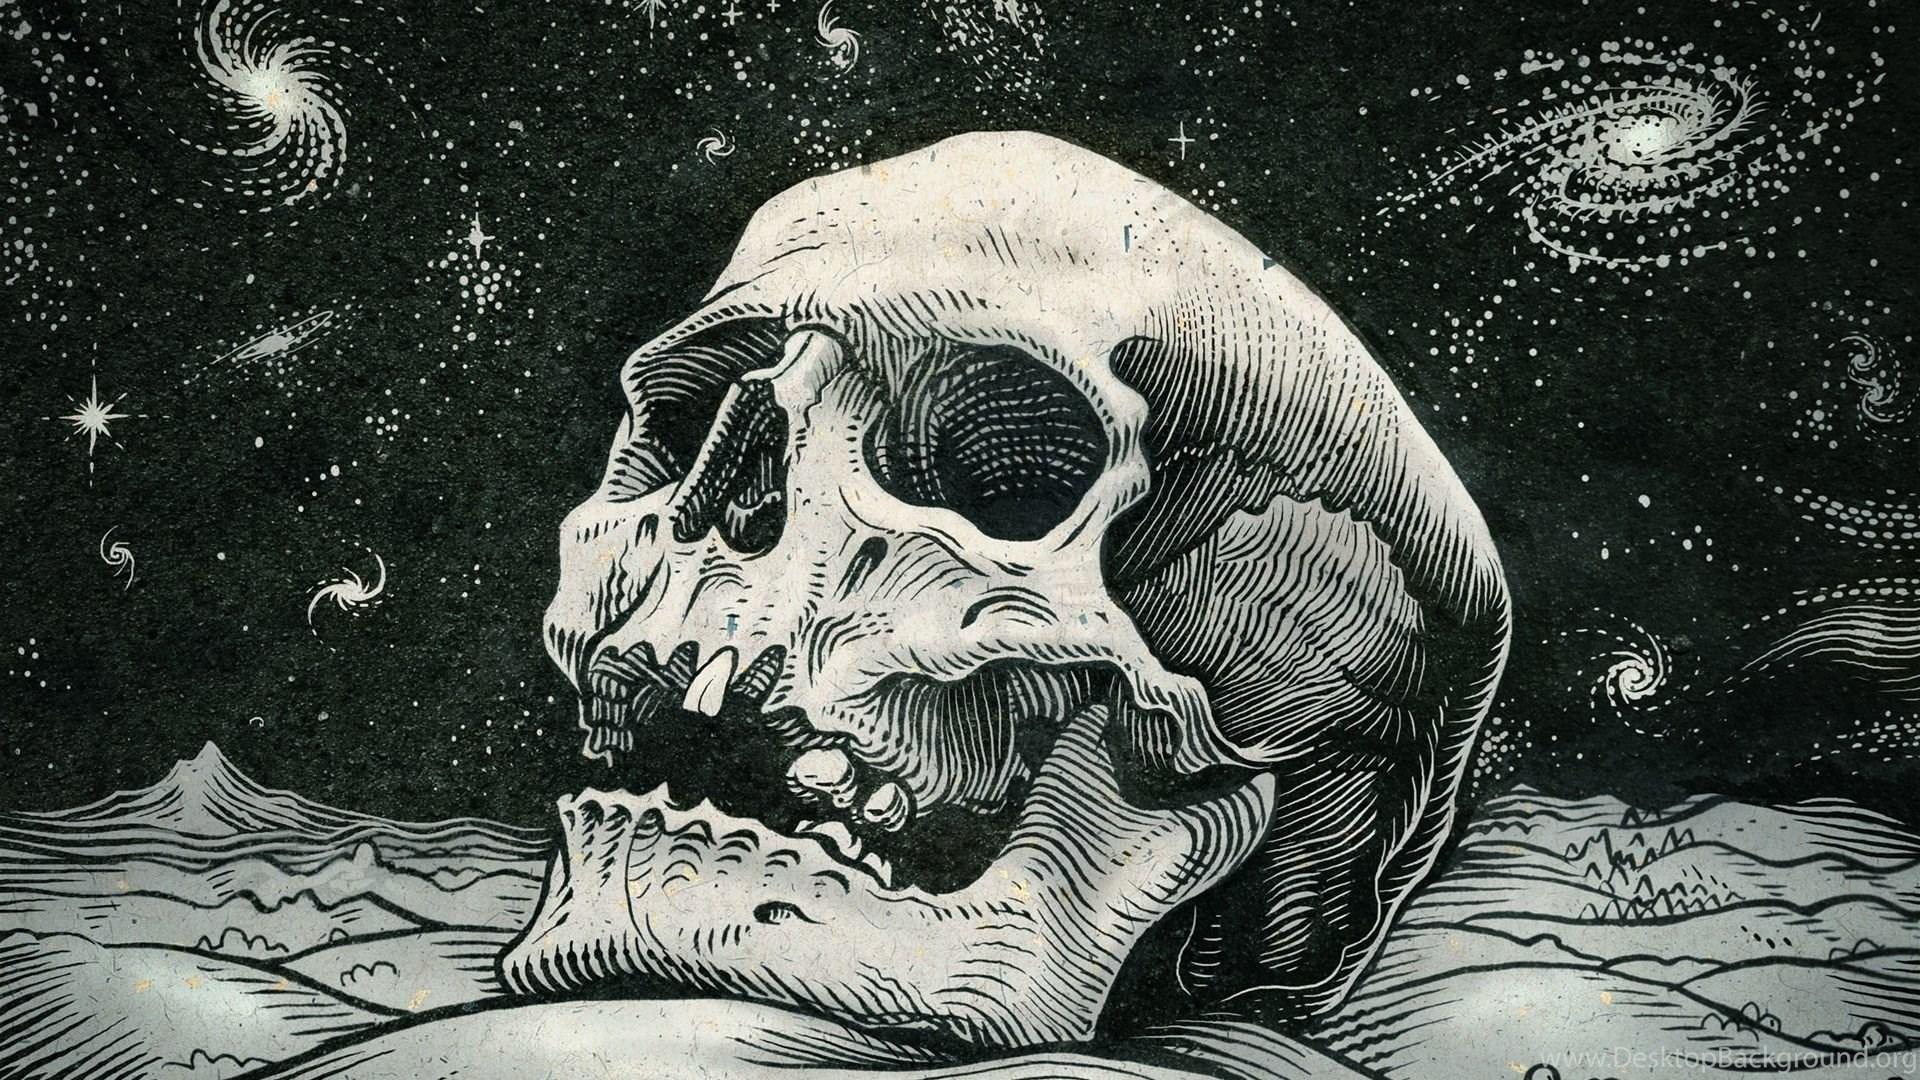 Full Hd 1080p Skull Wallpapers Hd Desktop Backgrounds 1920x1080